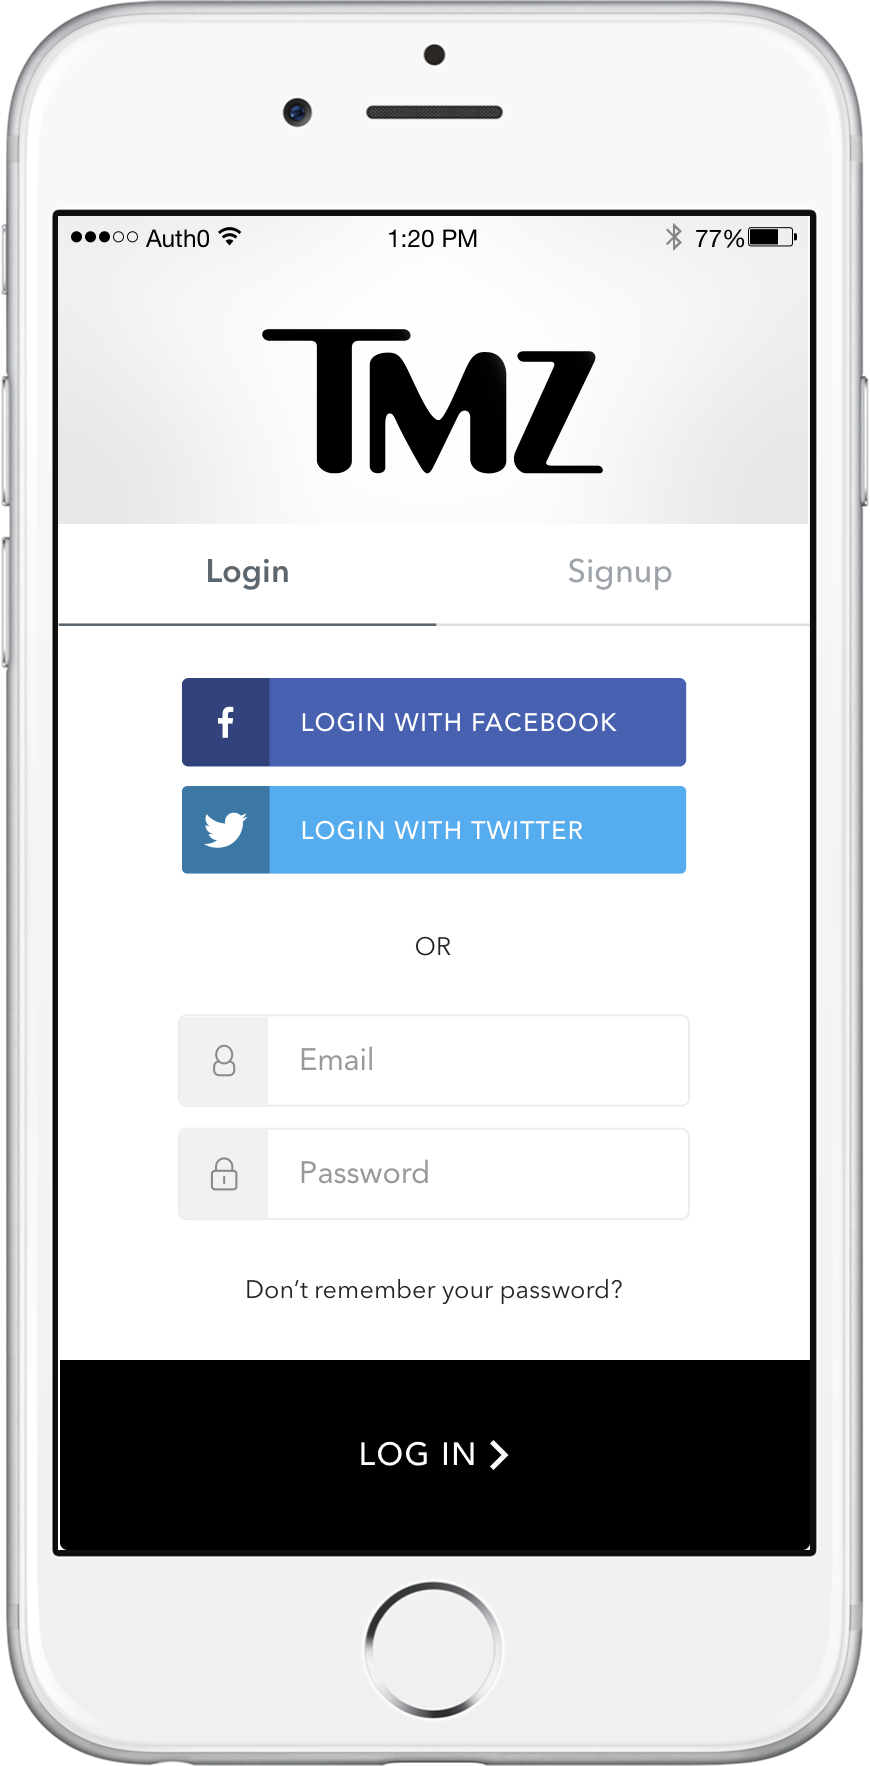 TMZ login with Lock